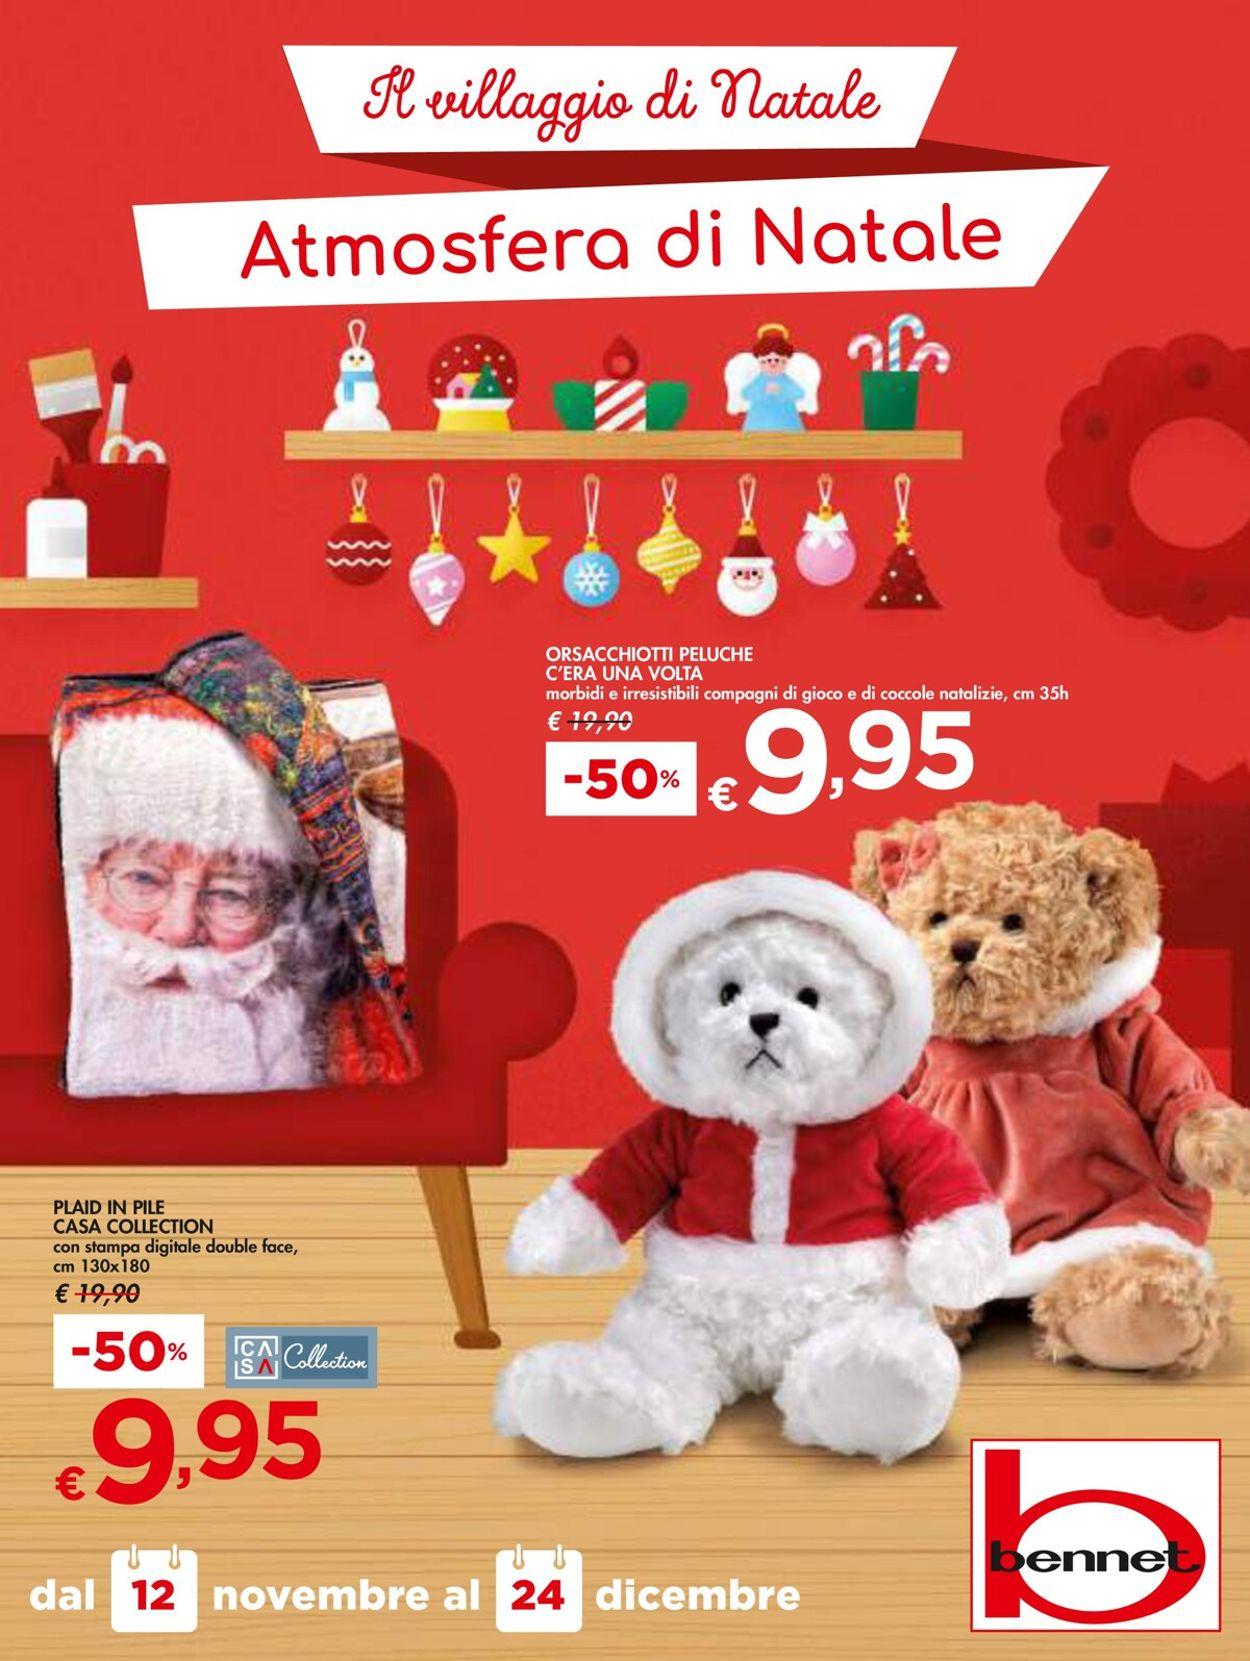 Volantino bennet - Natale 2020 - Offerte 12/11-24/12/2020